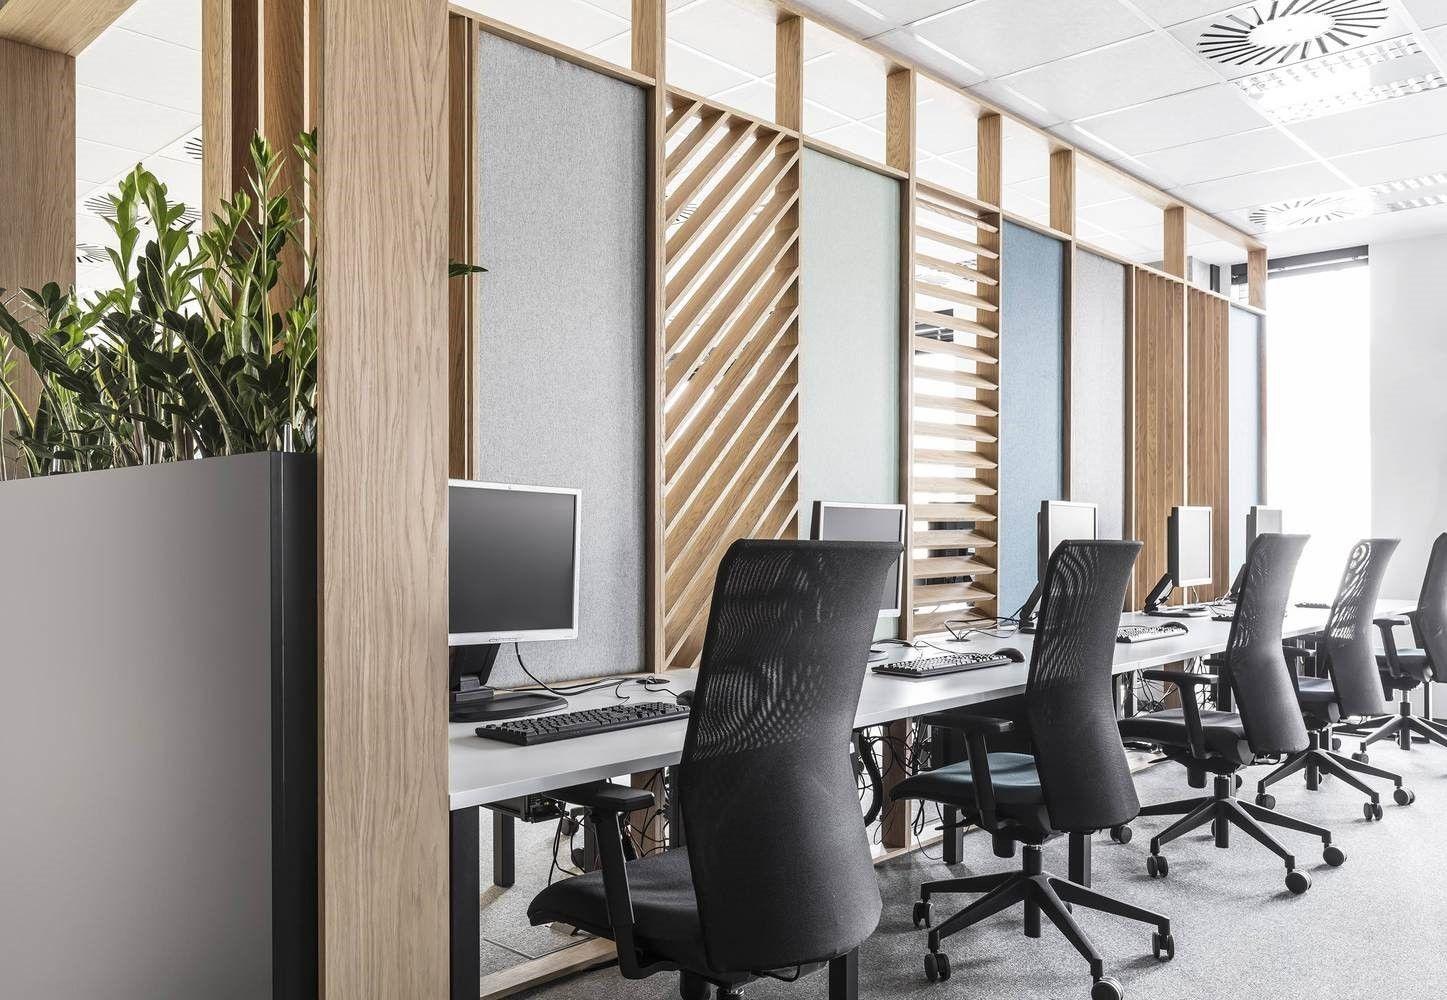 Diseño de Interiores de oficina, espacios de trabajo insonorizados en call center